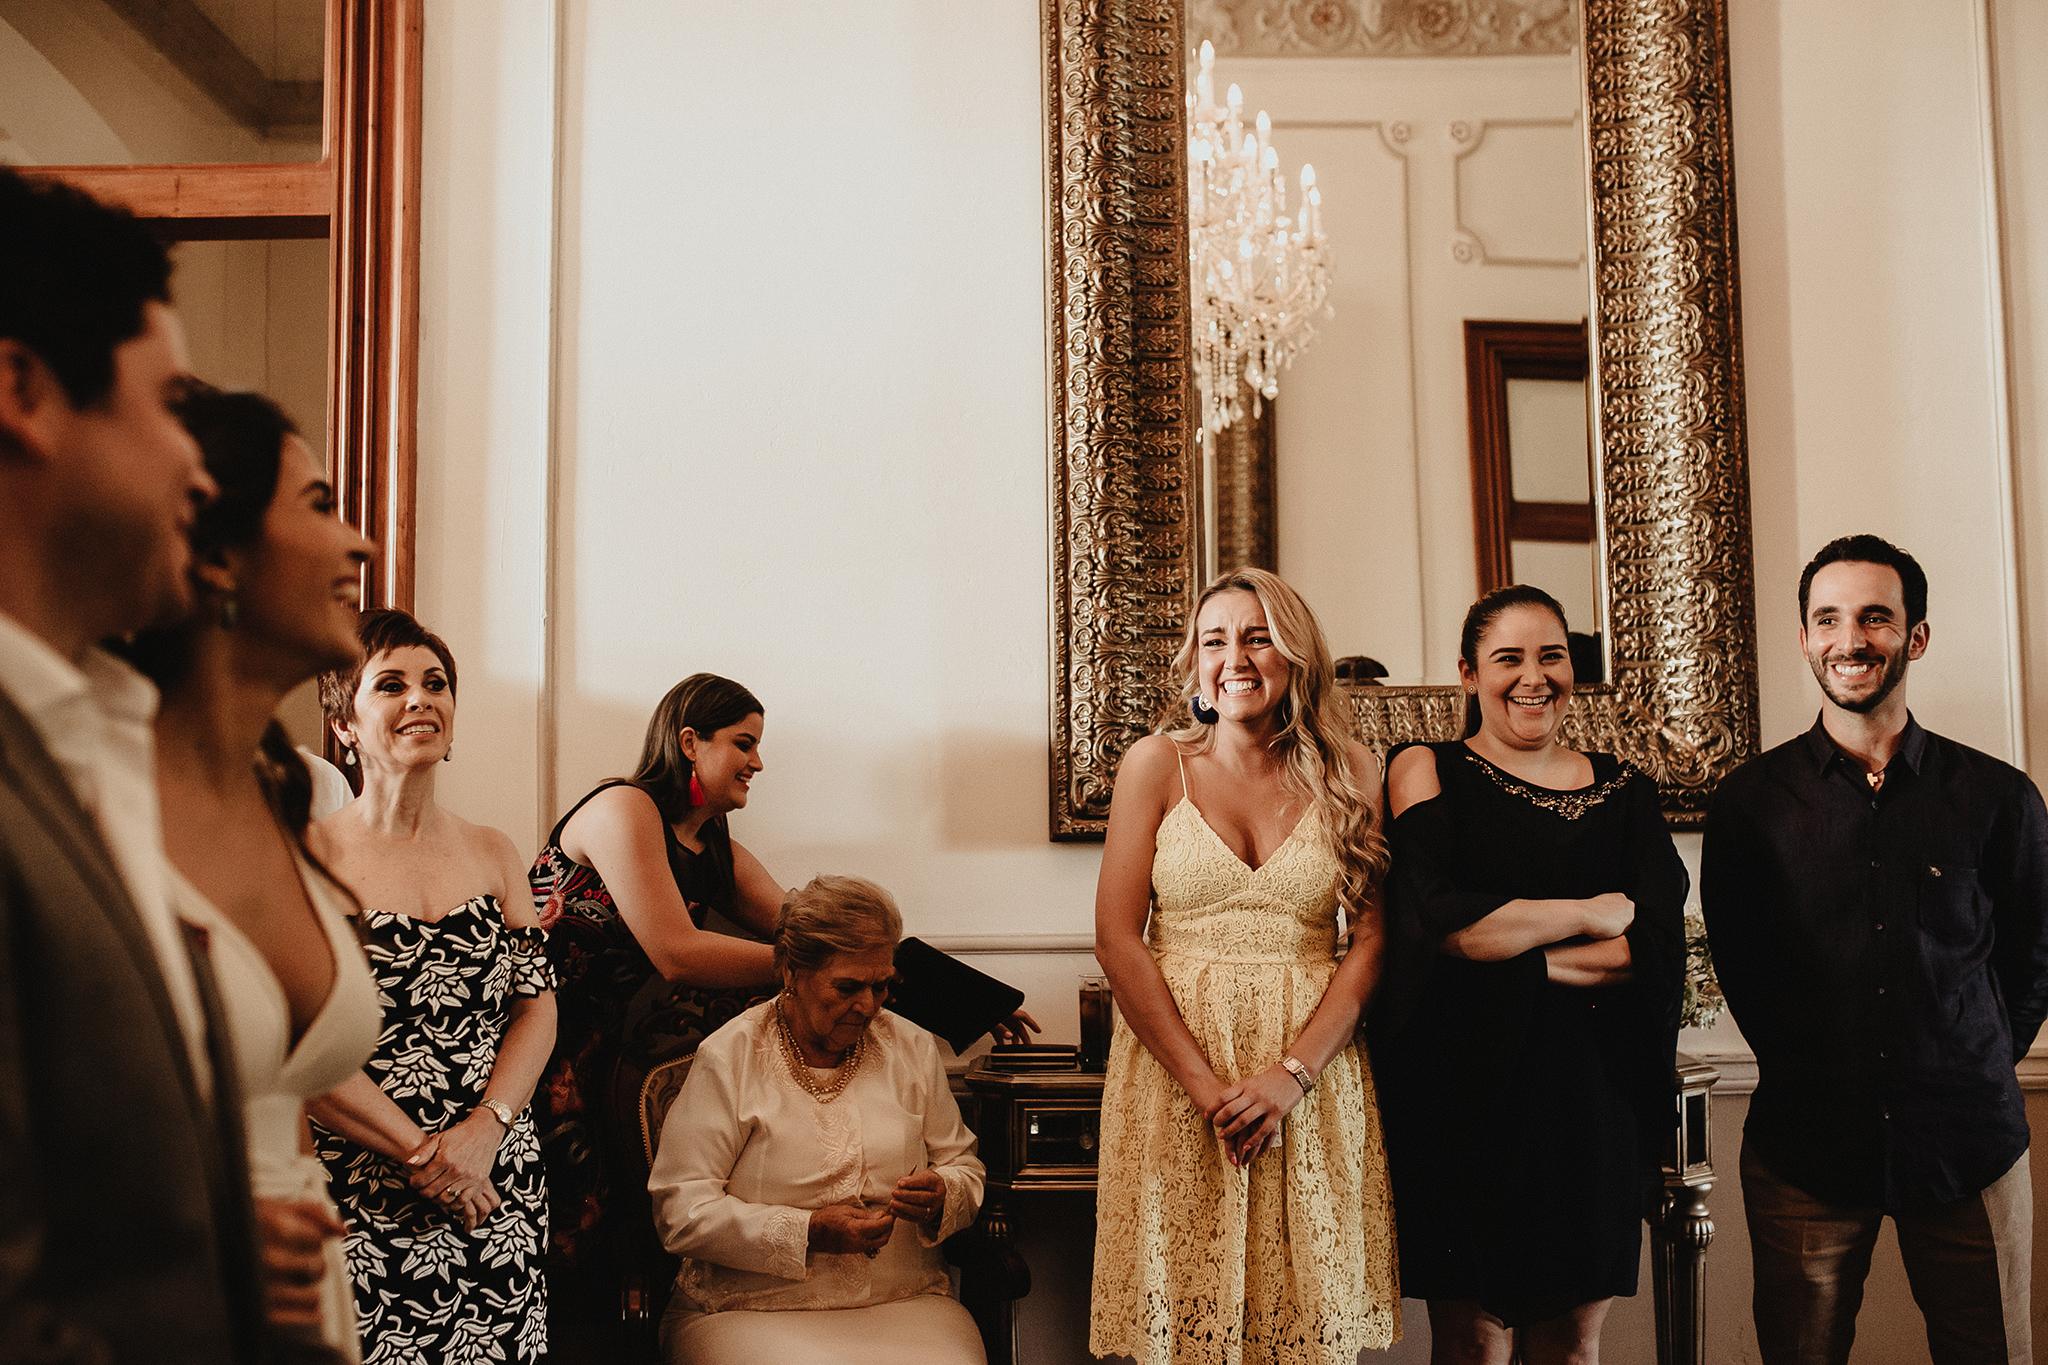 0092civil_Hacienda_WeddingDstination_MeridaYucatan_HaciendasMerida_BodasMexico_BodasYucatan_Boda_Destino.jpg